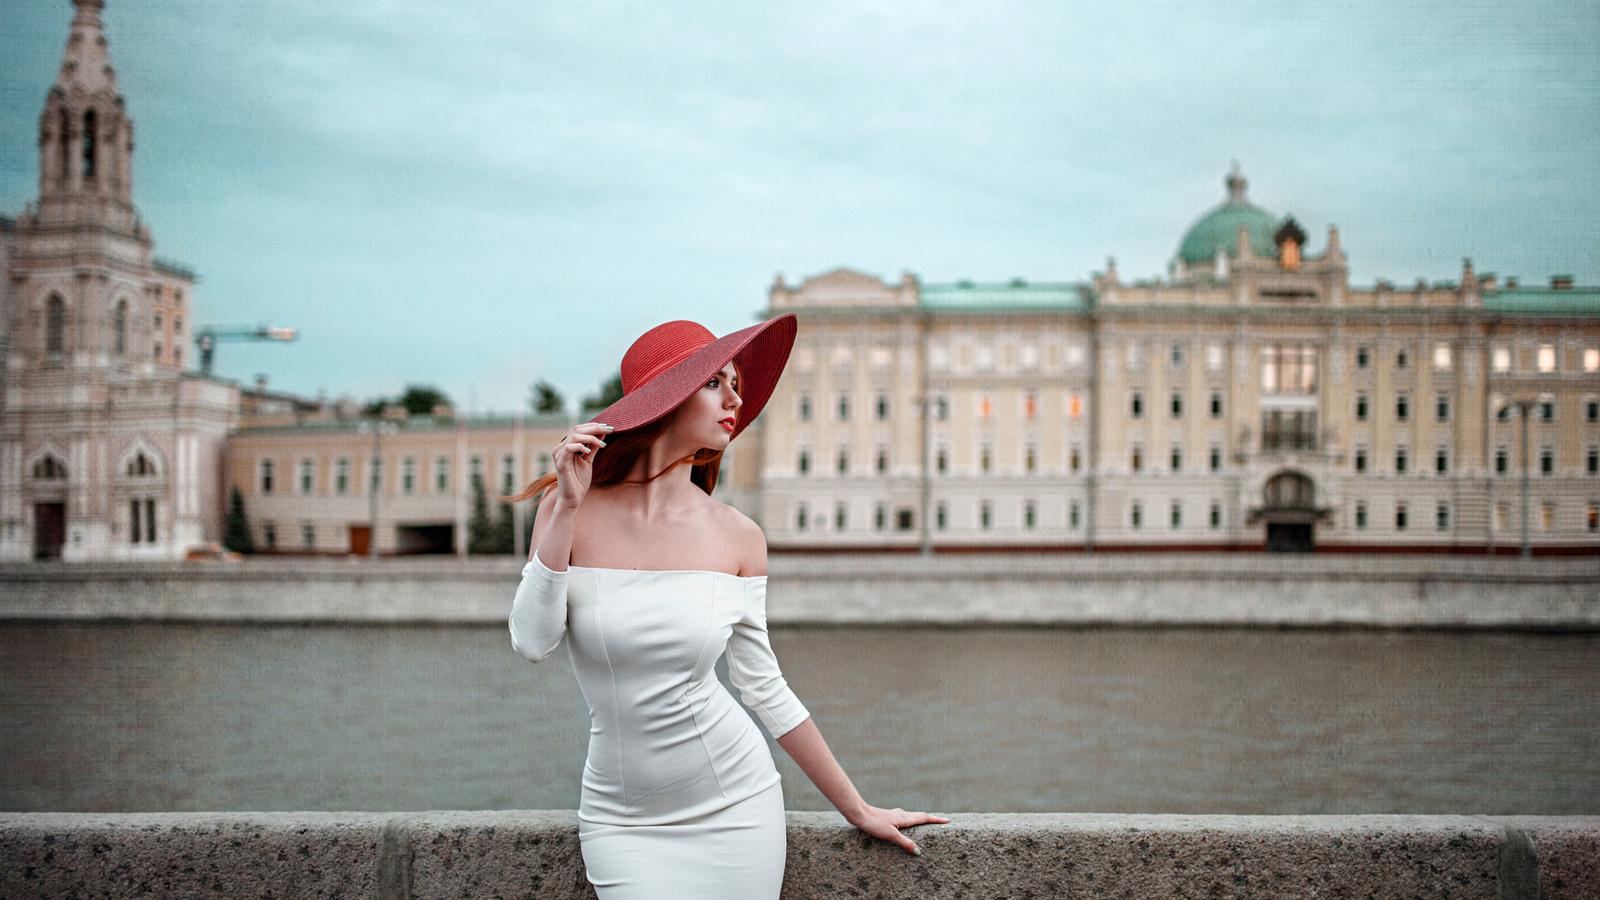 красавицы петербурга фото - 8